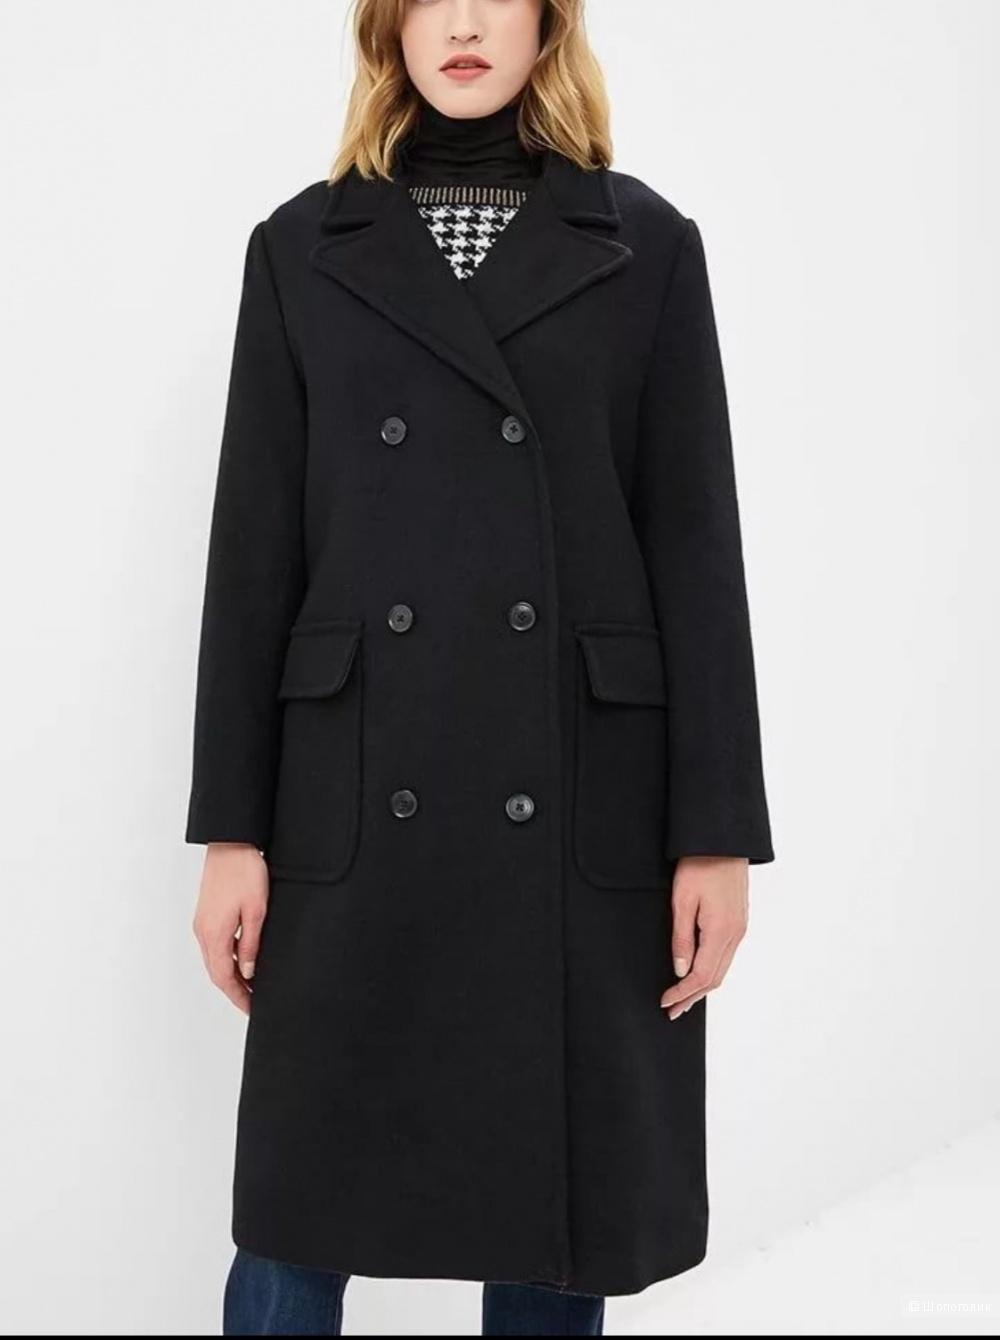 Пальто KAOS, размер 46IT, на 46-48-50